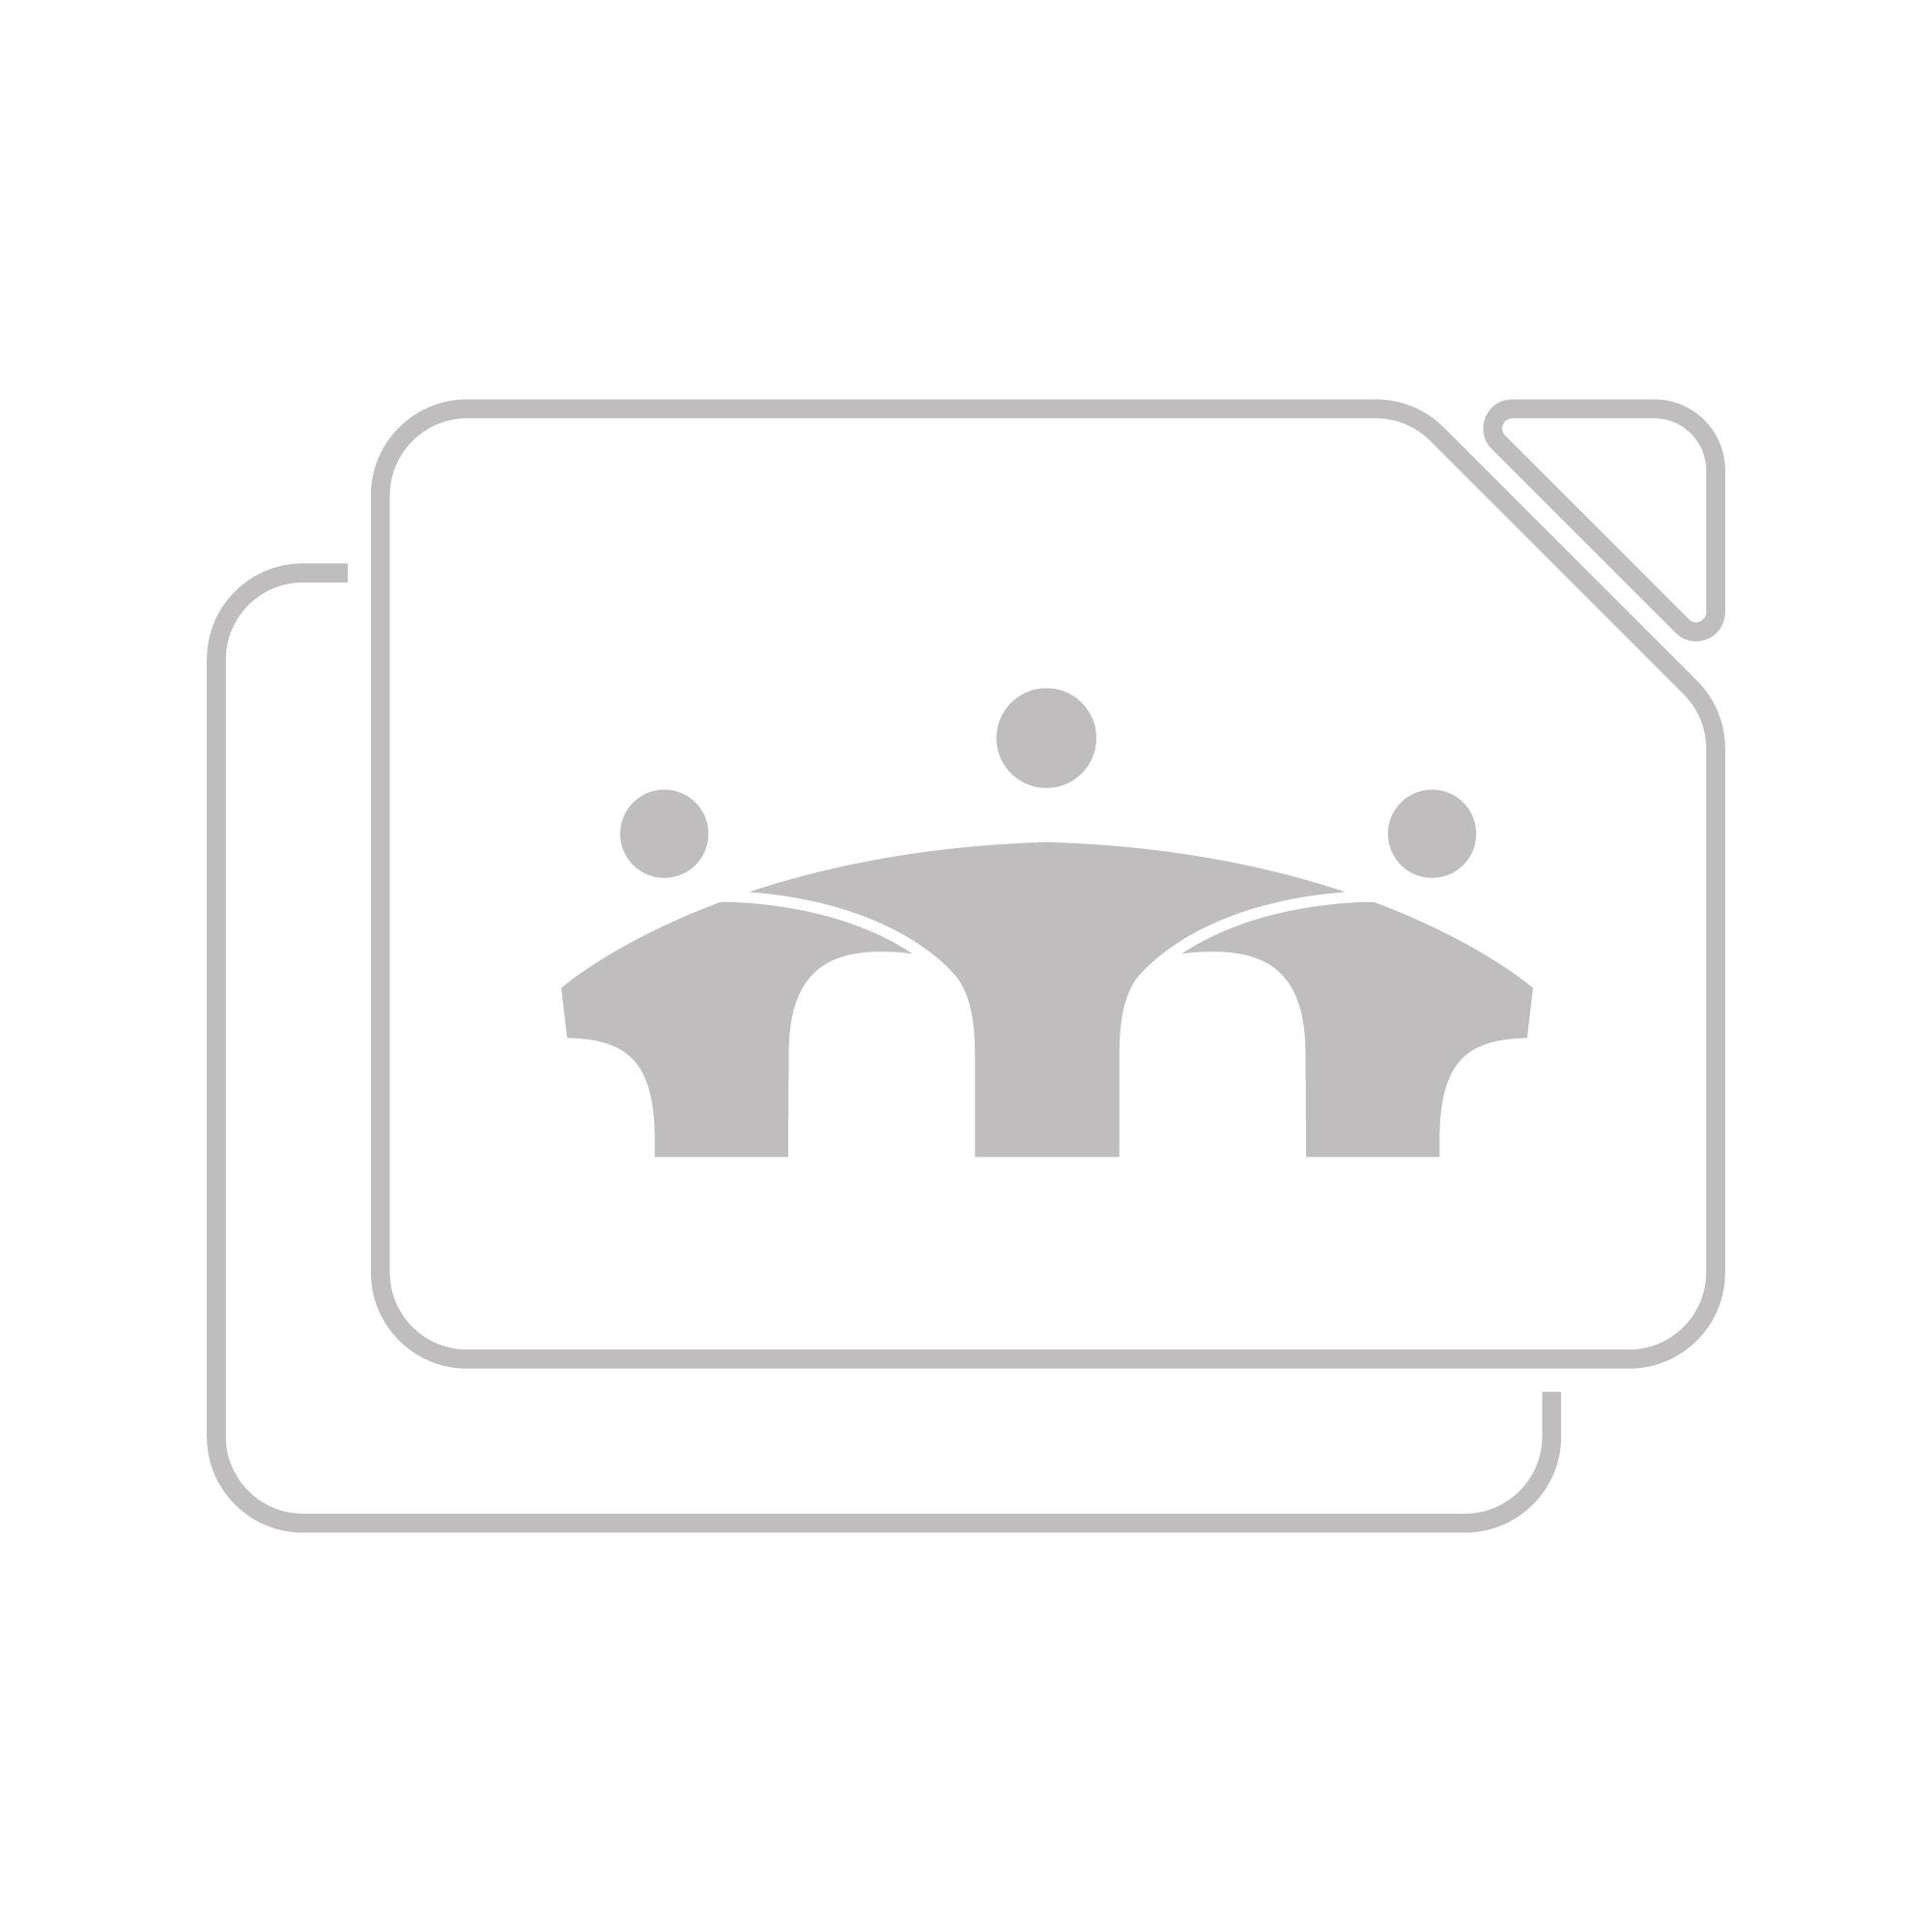 SanDisk iXpand Flash Drive 128GB - Type C